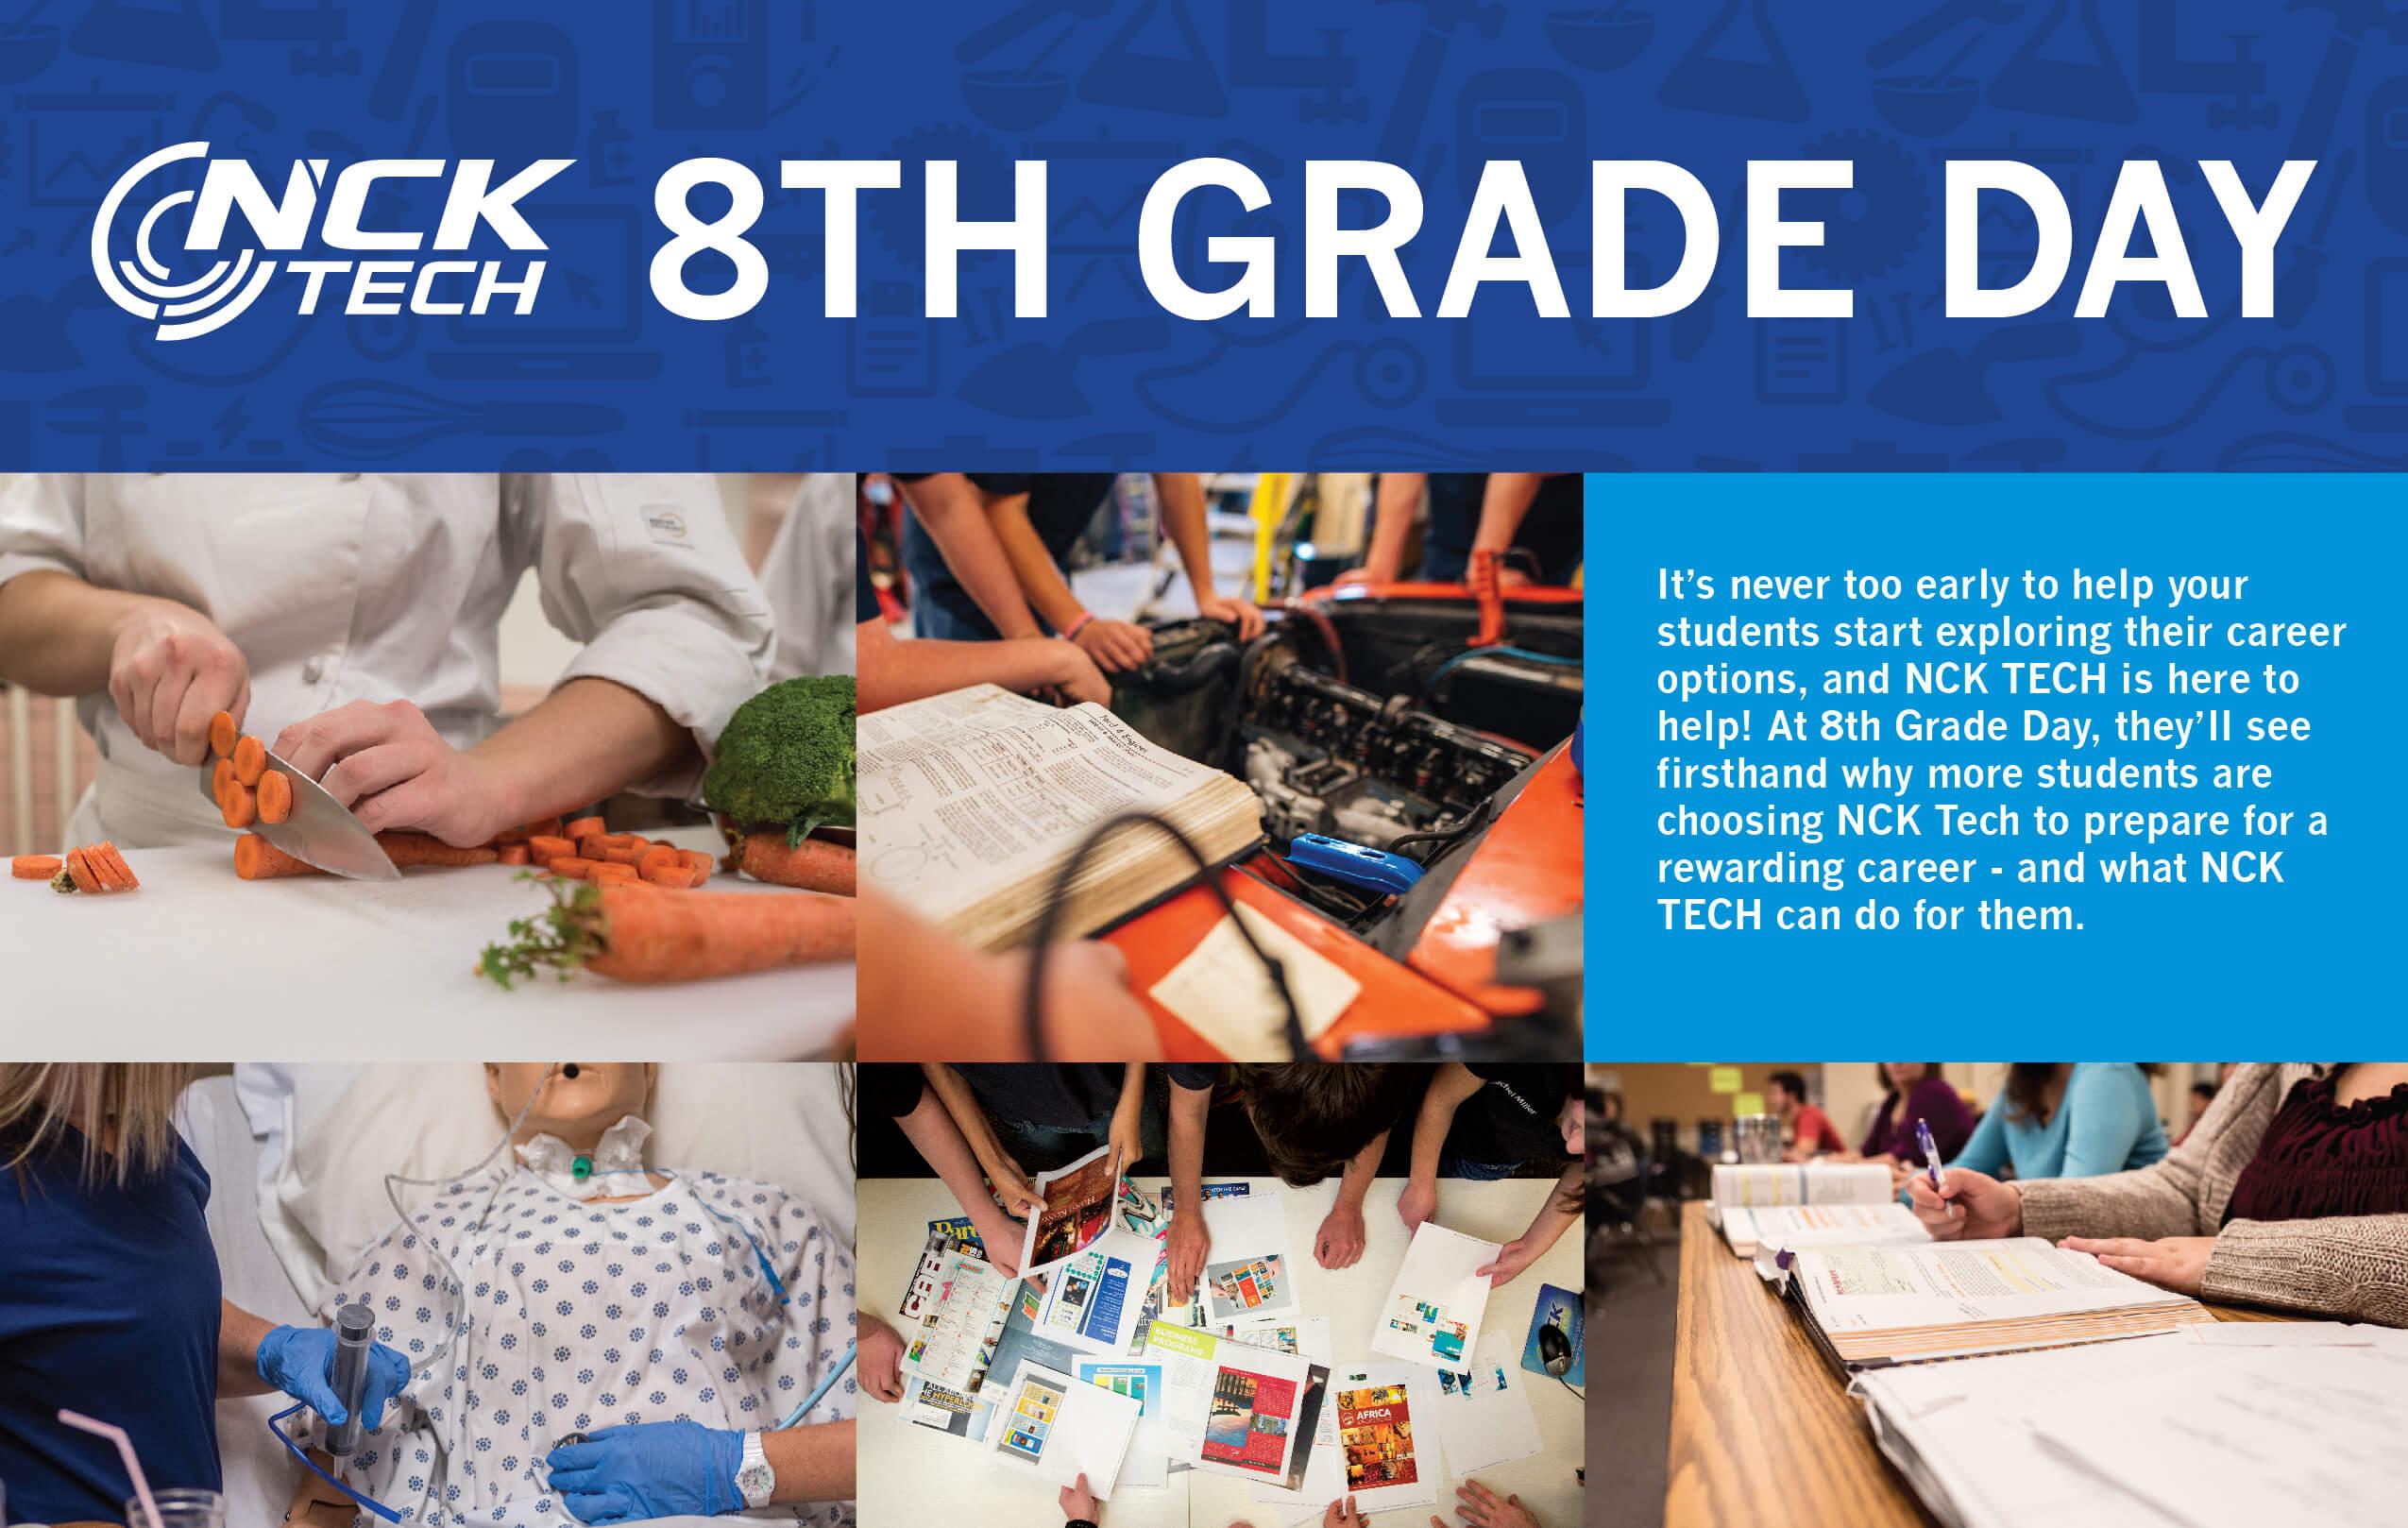 Eighth grade day at NCK Tech.